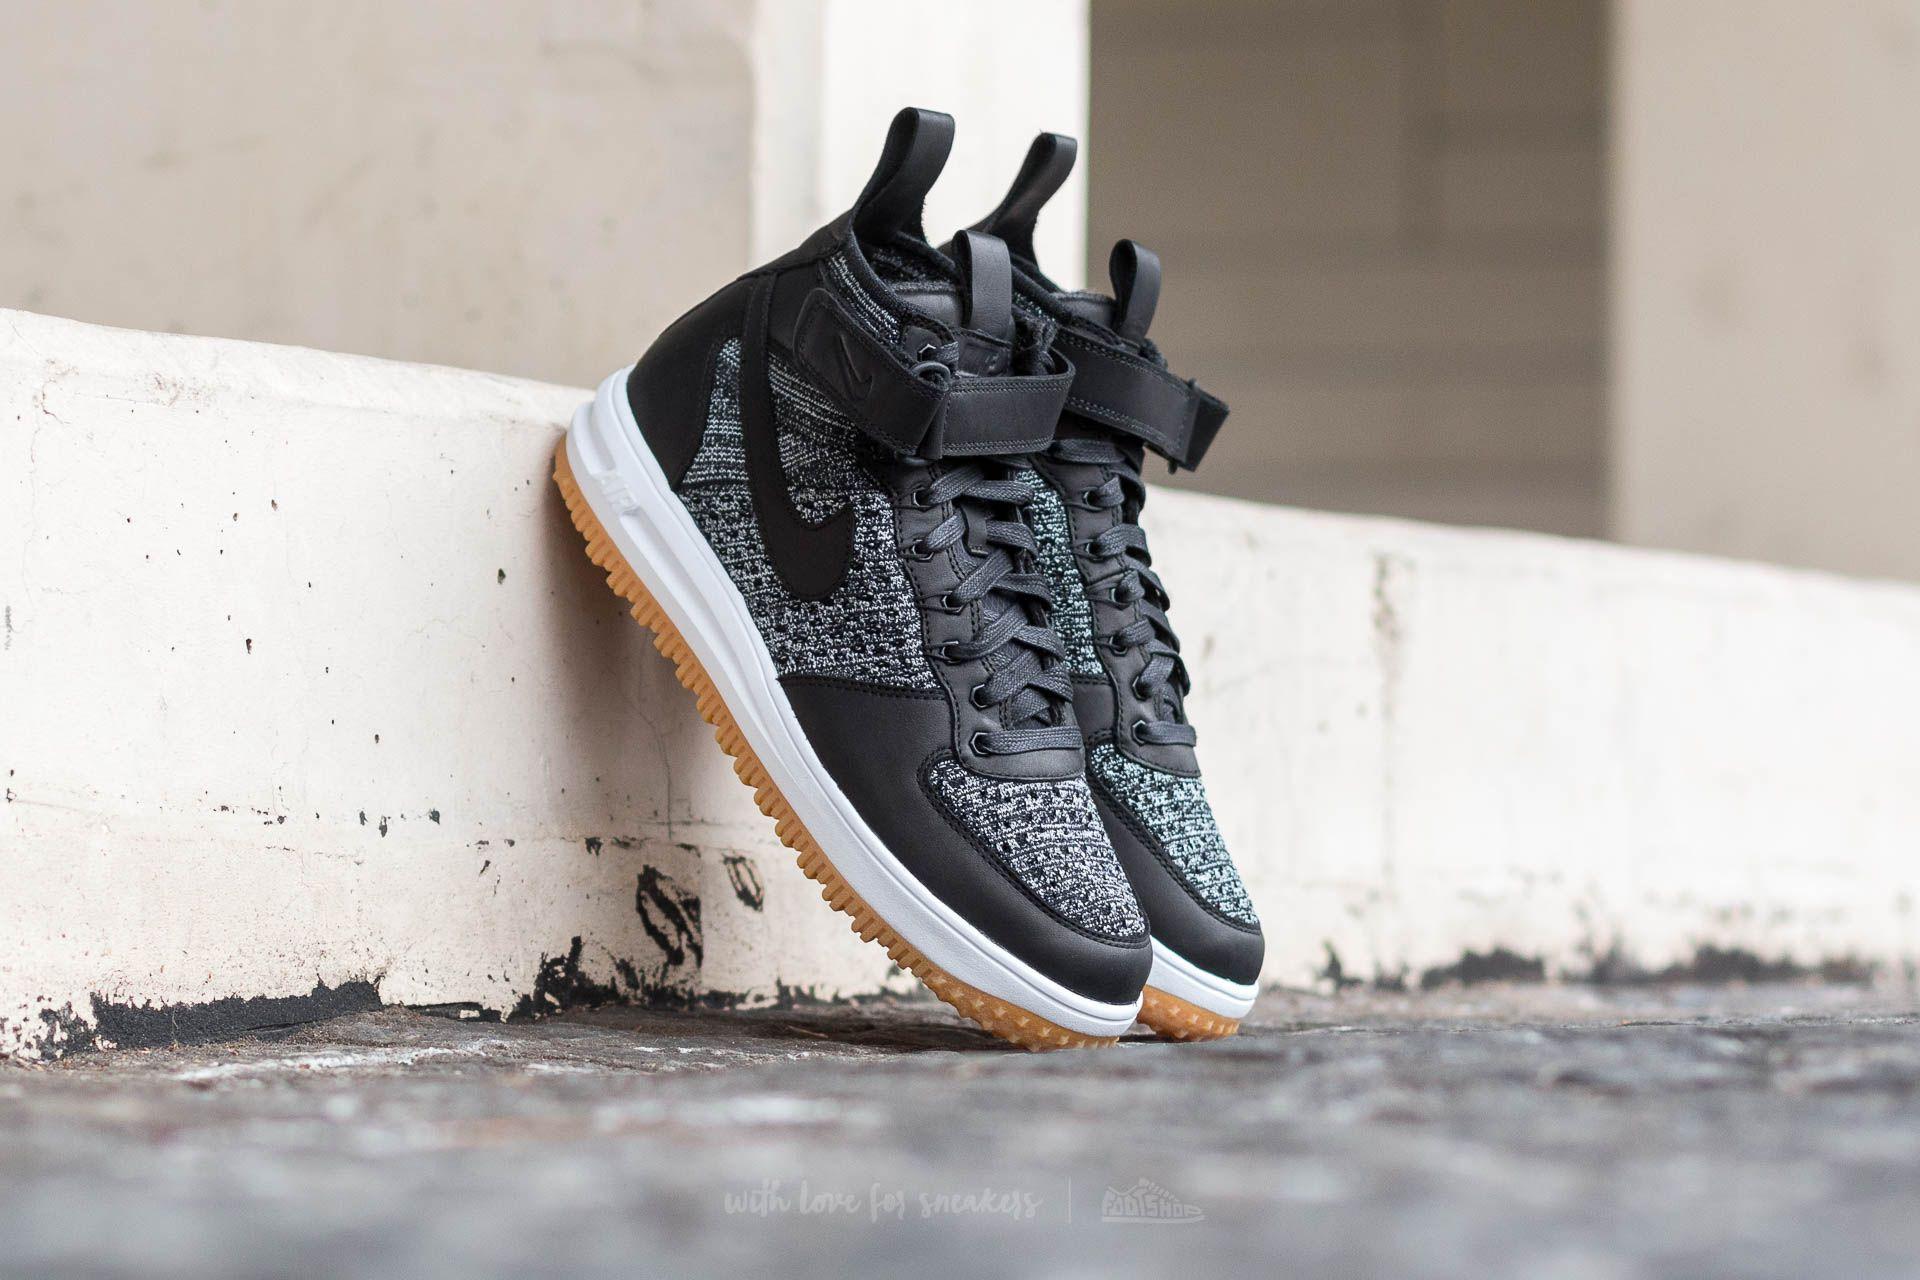 Nike Lunar Force 1 Flyknit Workboot Black/ White-Wolf Grey